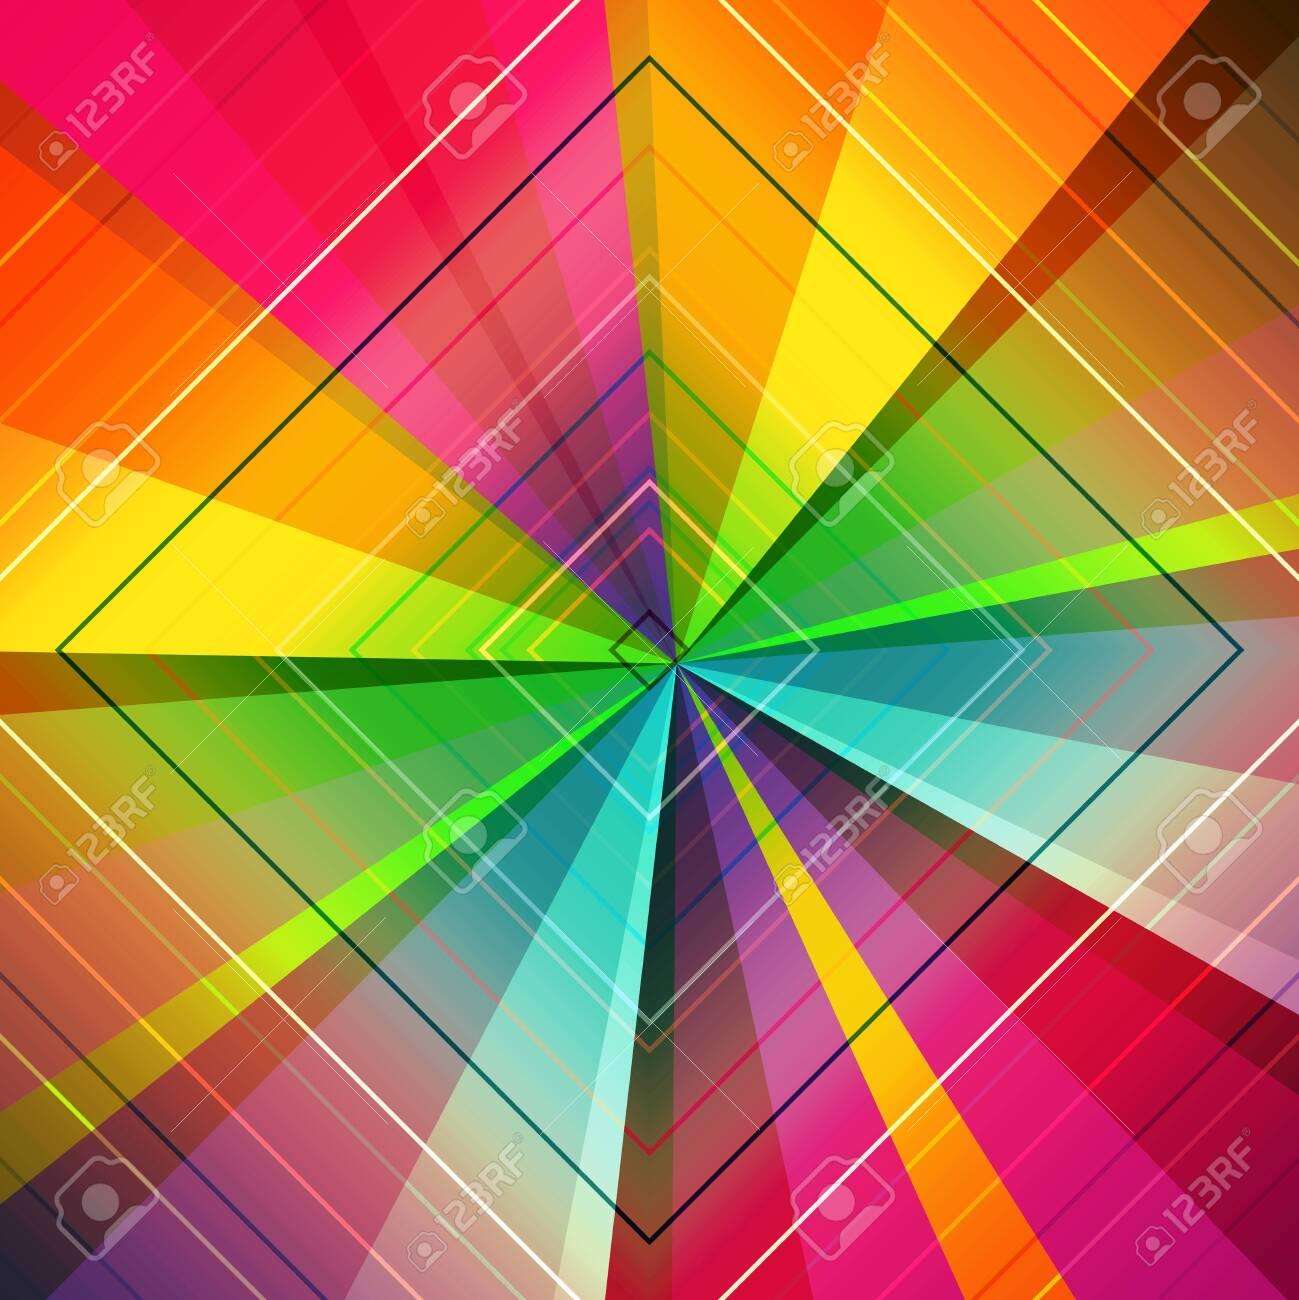 Radiating, converging lines, rays multi color background. Star burst, sunburst abstract backdrop - 134177314